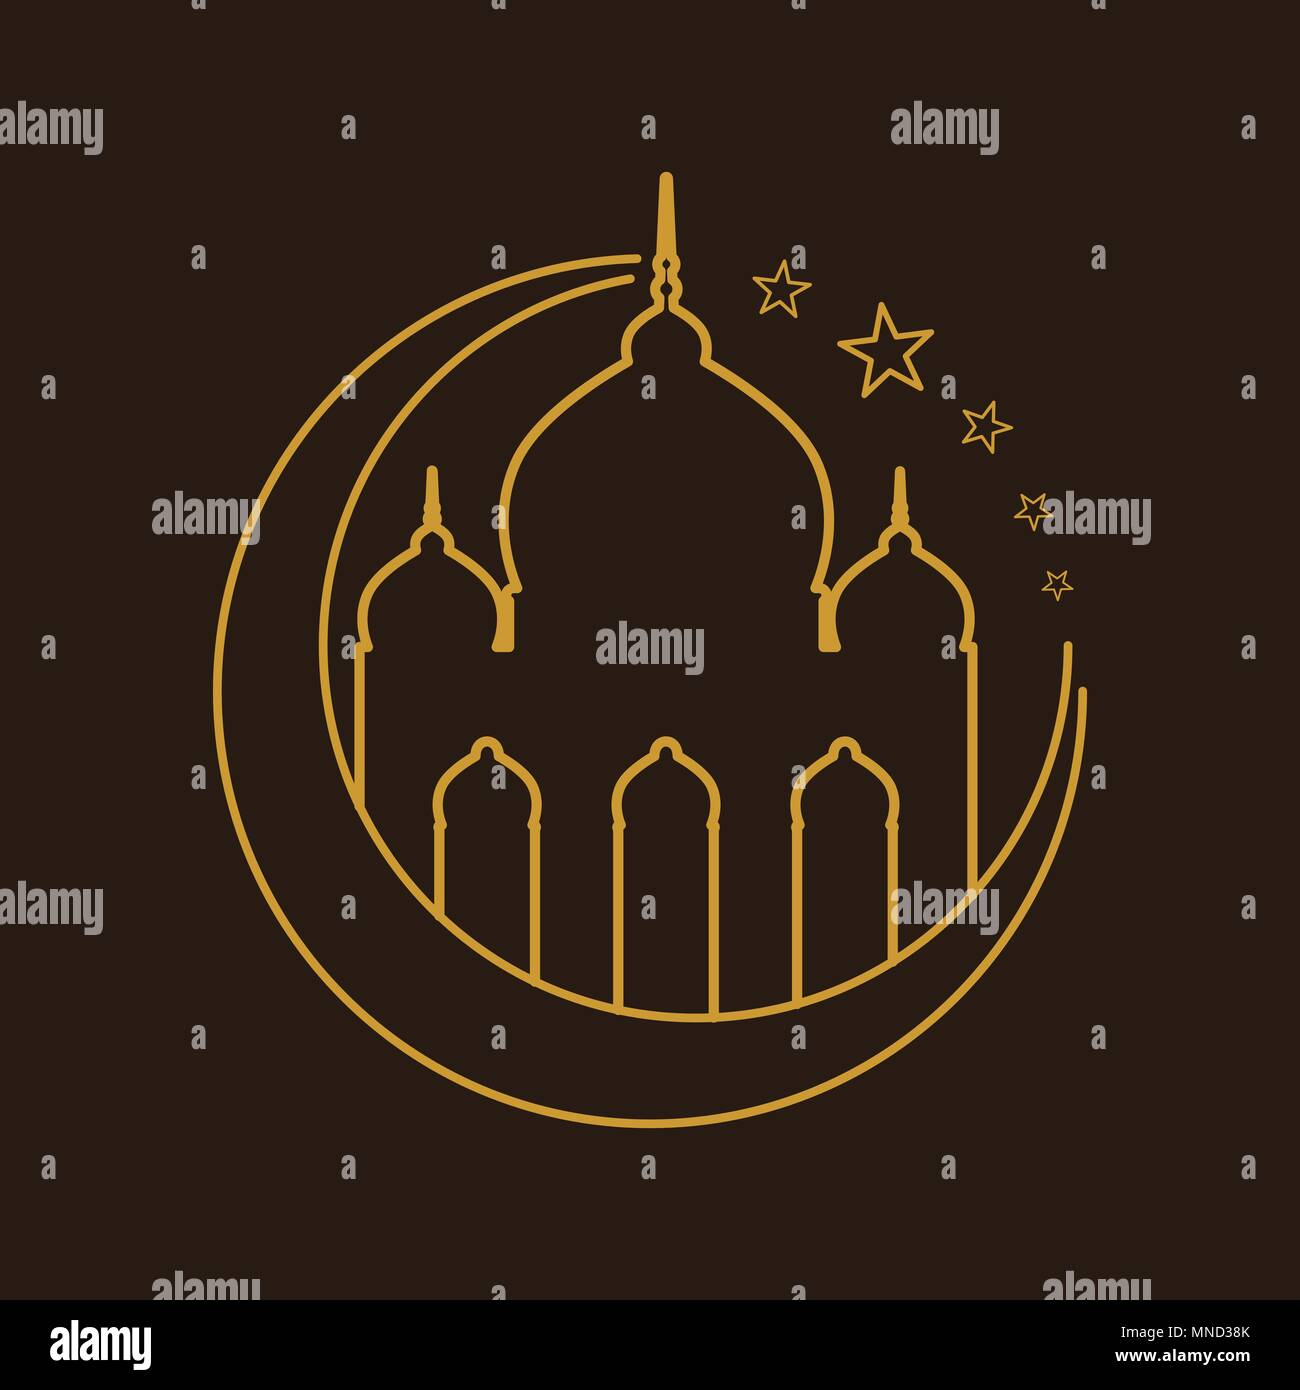 Islamic Vector Vectors Stock Photos & Islamic Vector